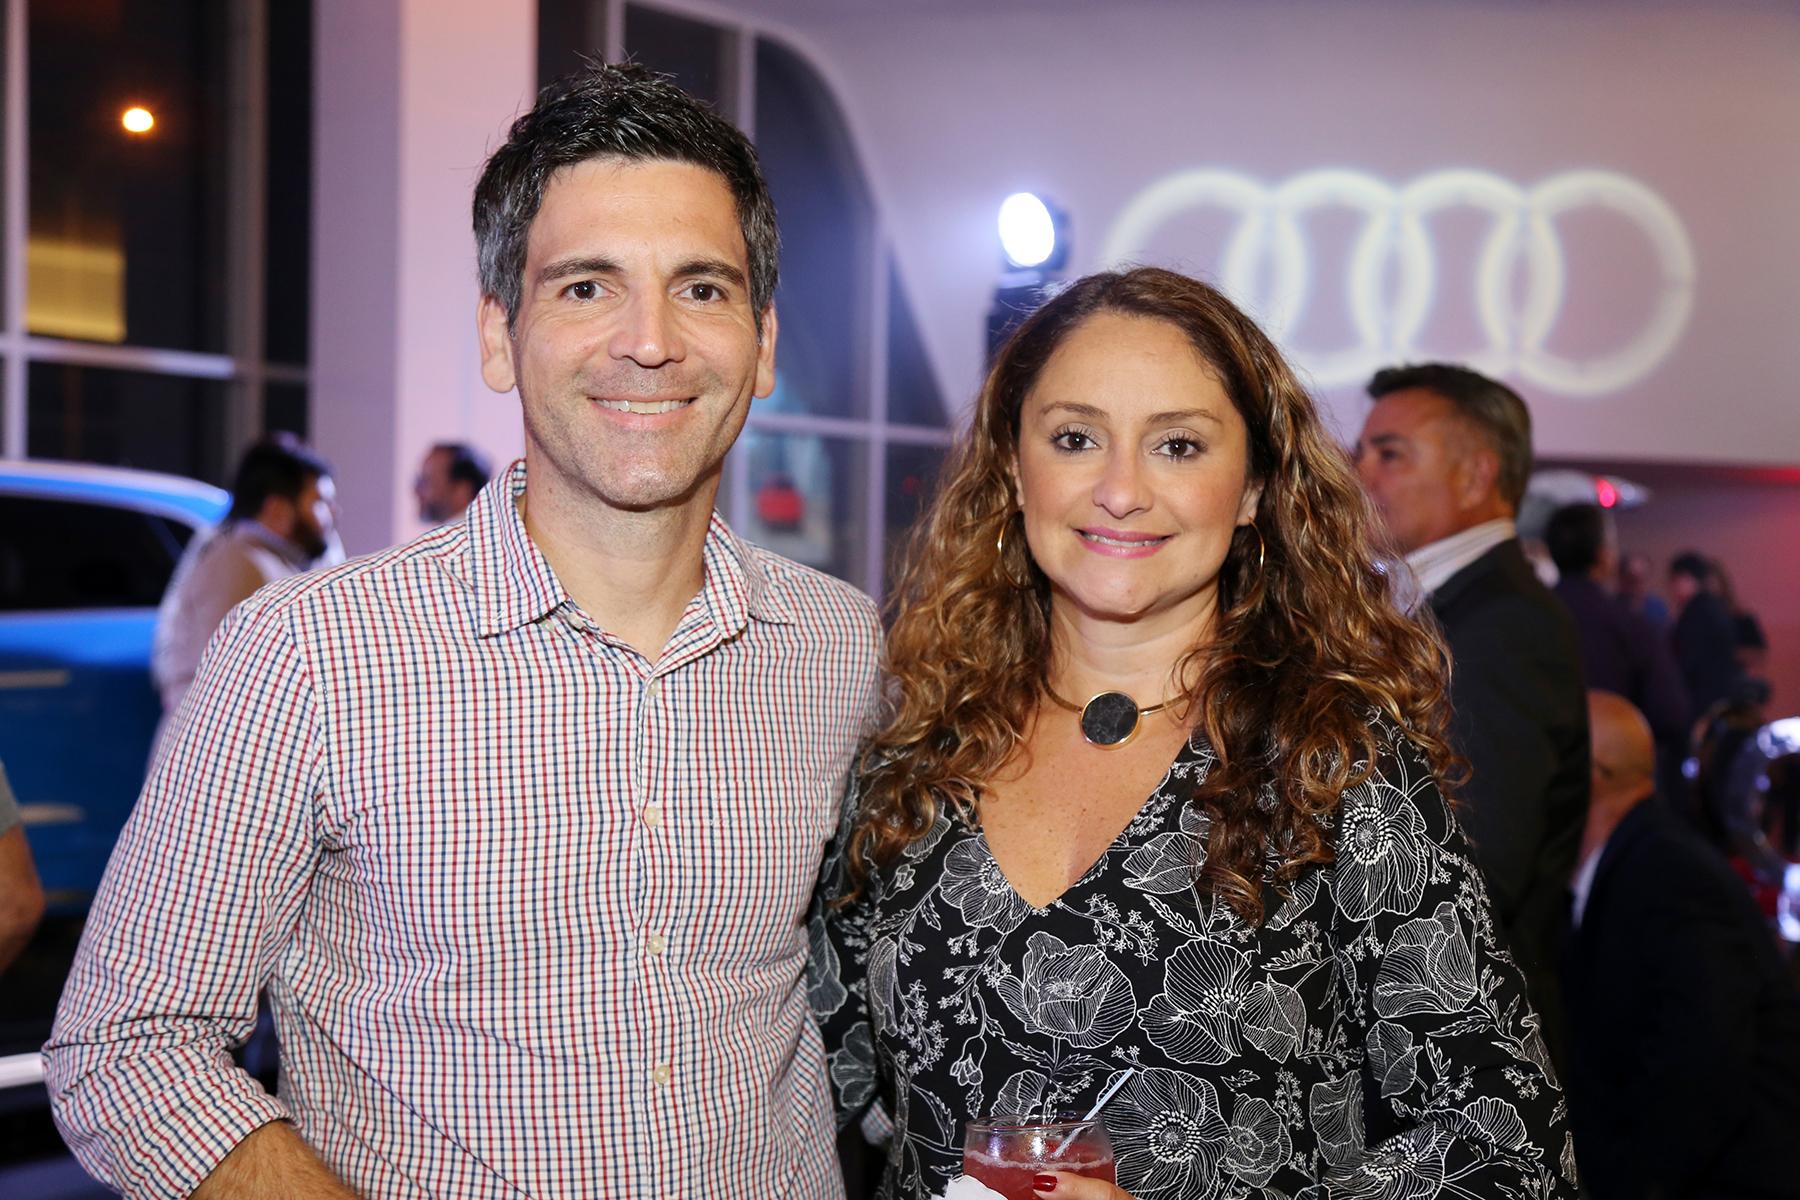 Antonio Chico e Ivette López.Foto Nichole Saldarriaga